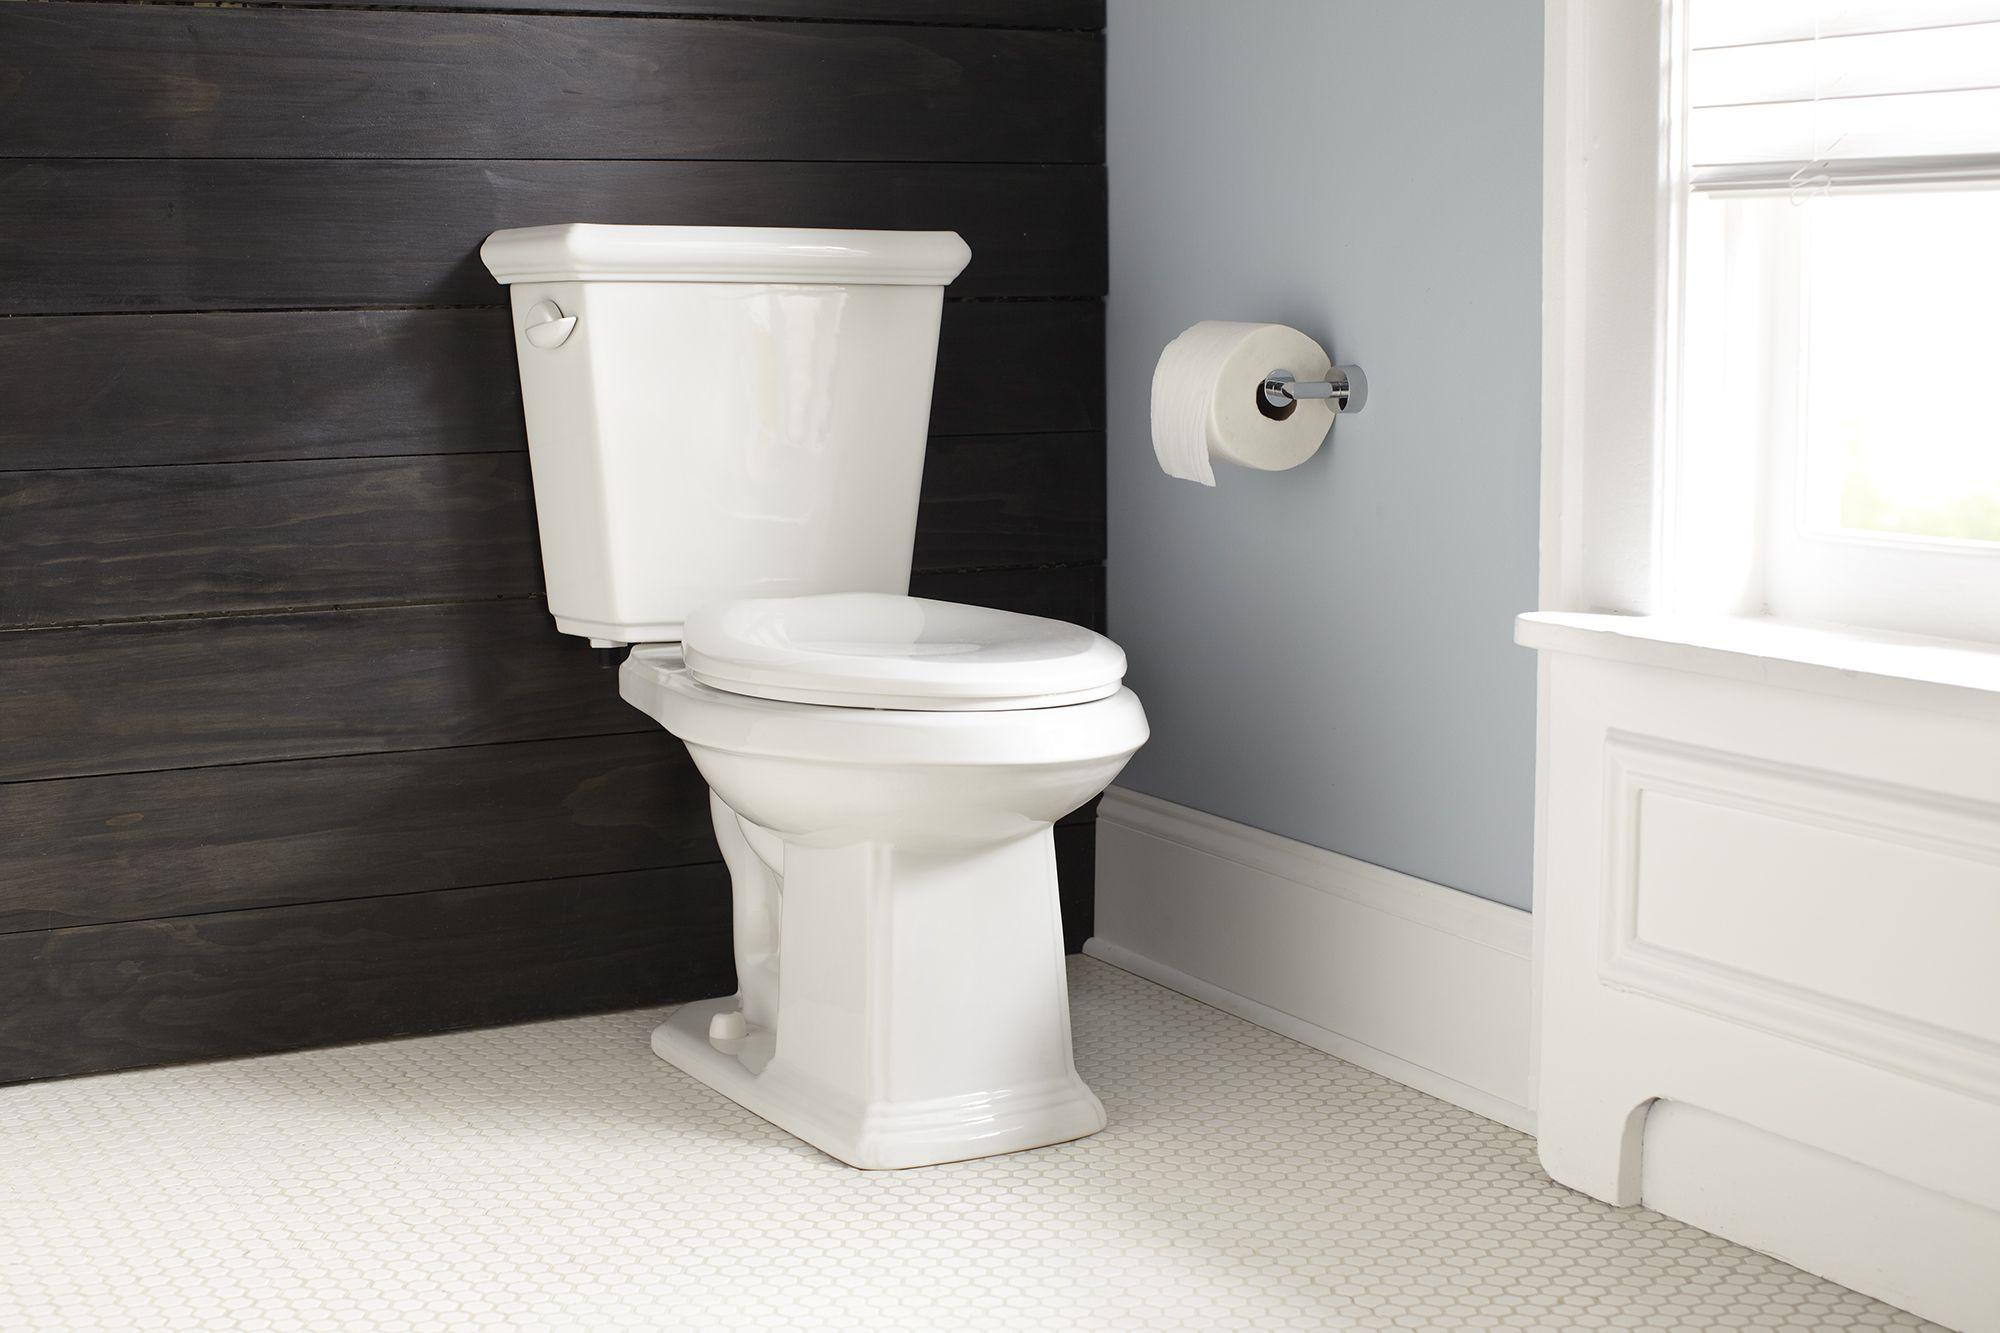 Logan Square 1 28 Gpf 12 Quot Rough In Two Piece Elongated Toilet Gerber Plumbing Toilet Tank Toilet China Toilet